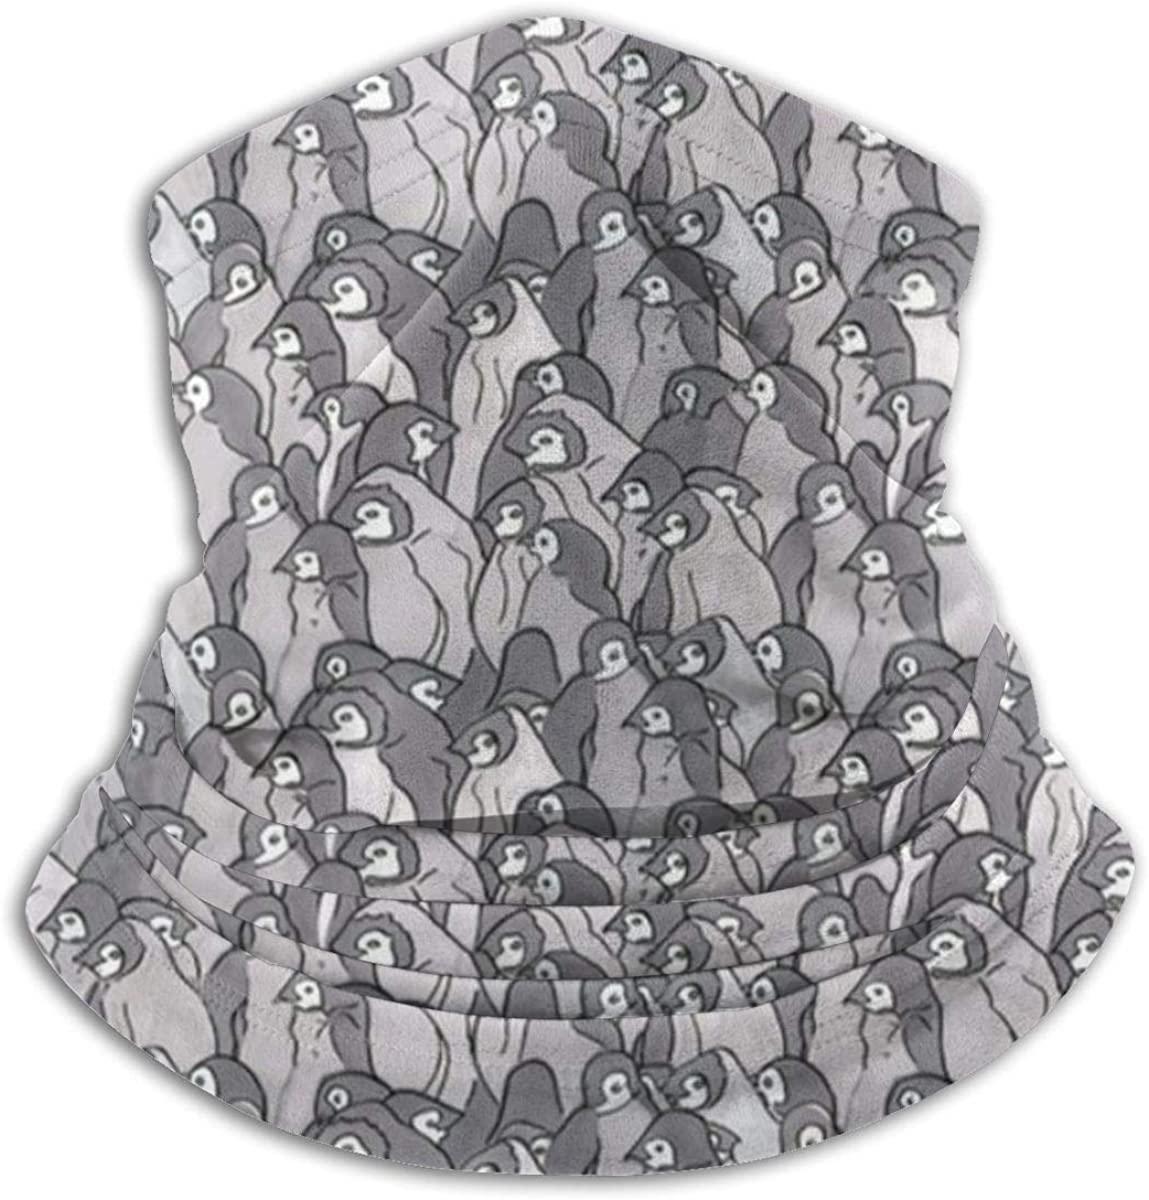 Unisex WinterCrowded Penguins Seamless Face Mask Bandanas for Dust, Outdoors, Festivals, Sports Headkerchief